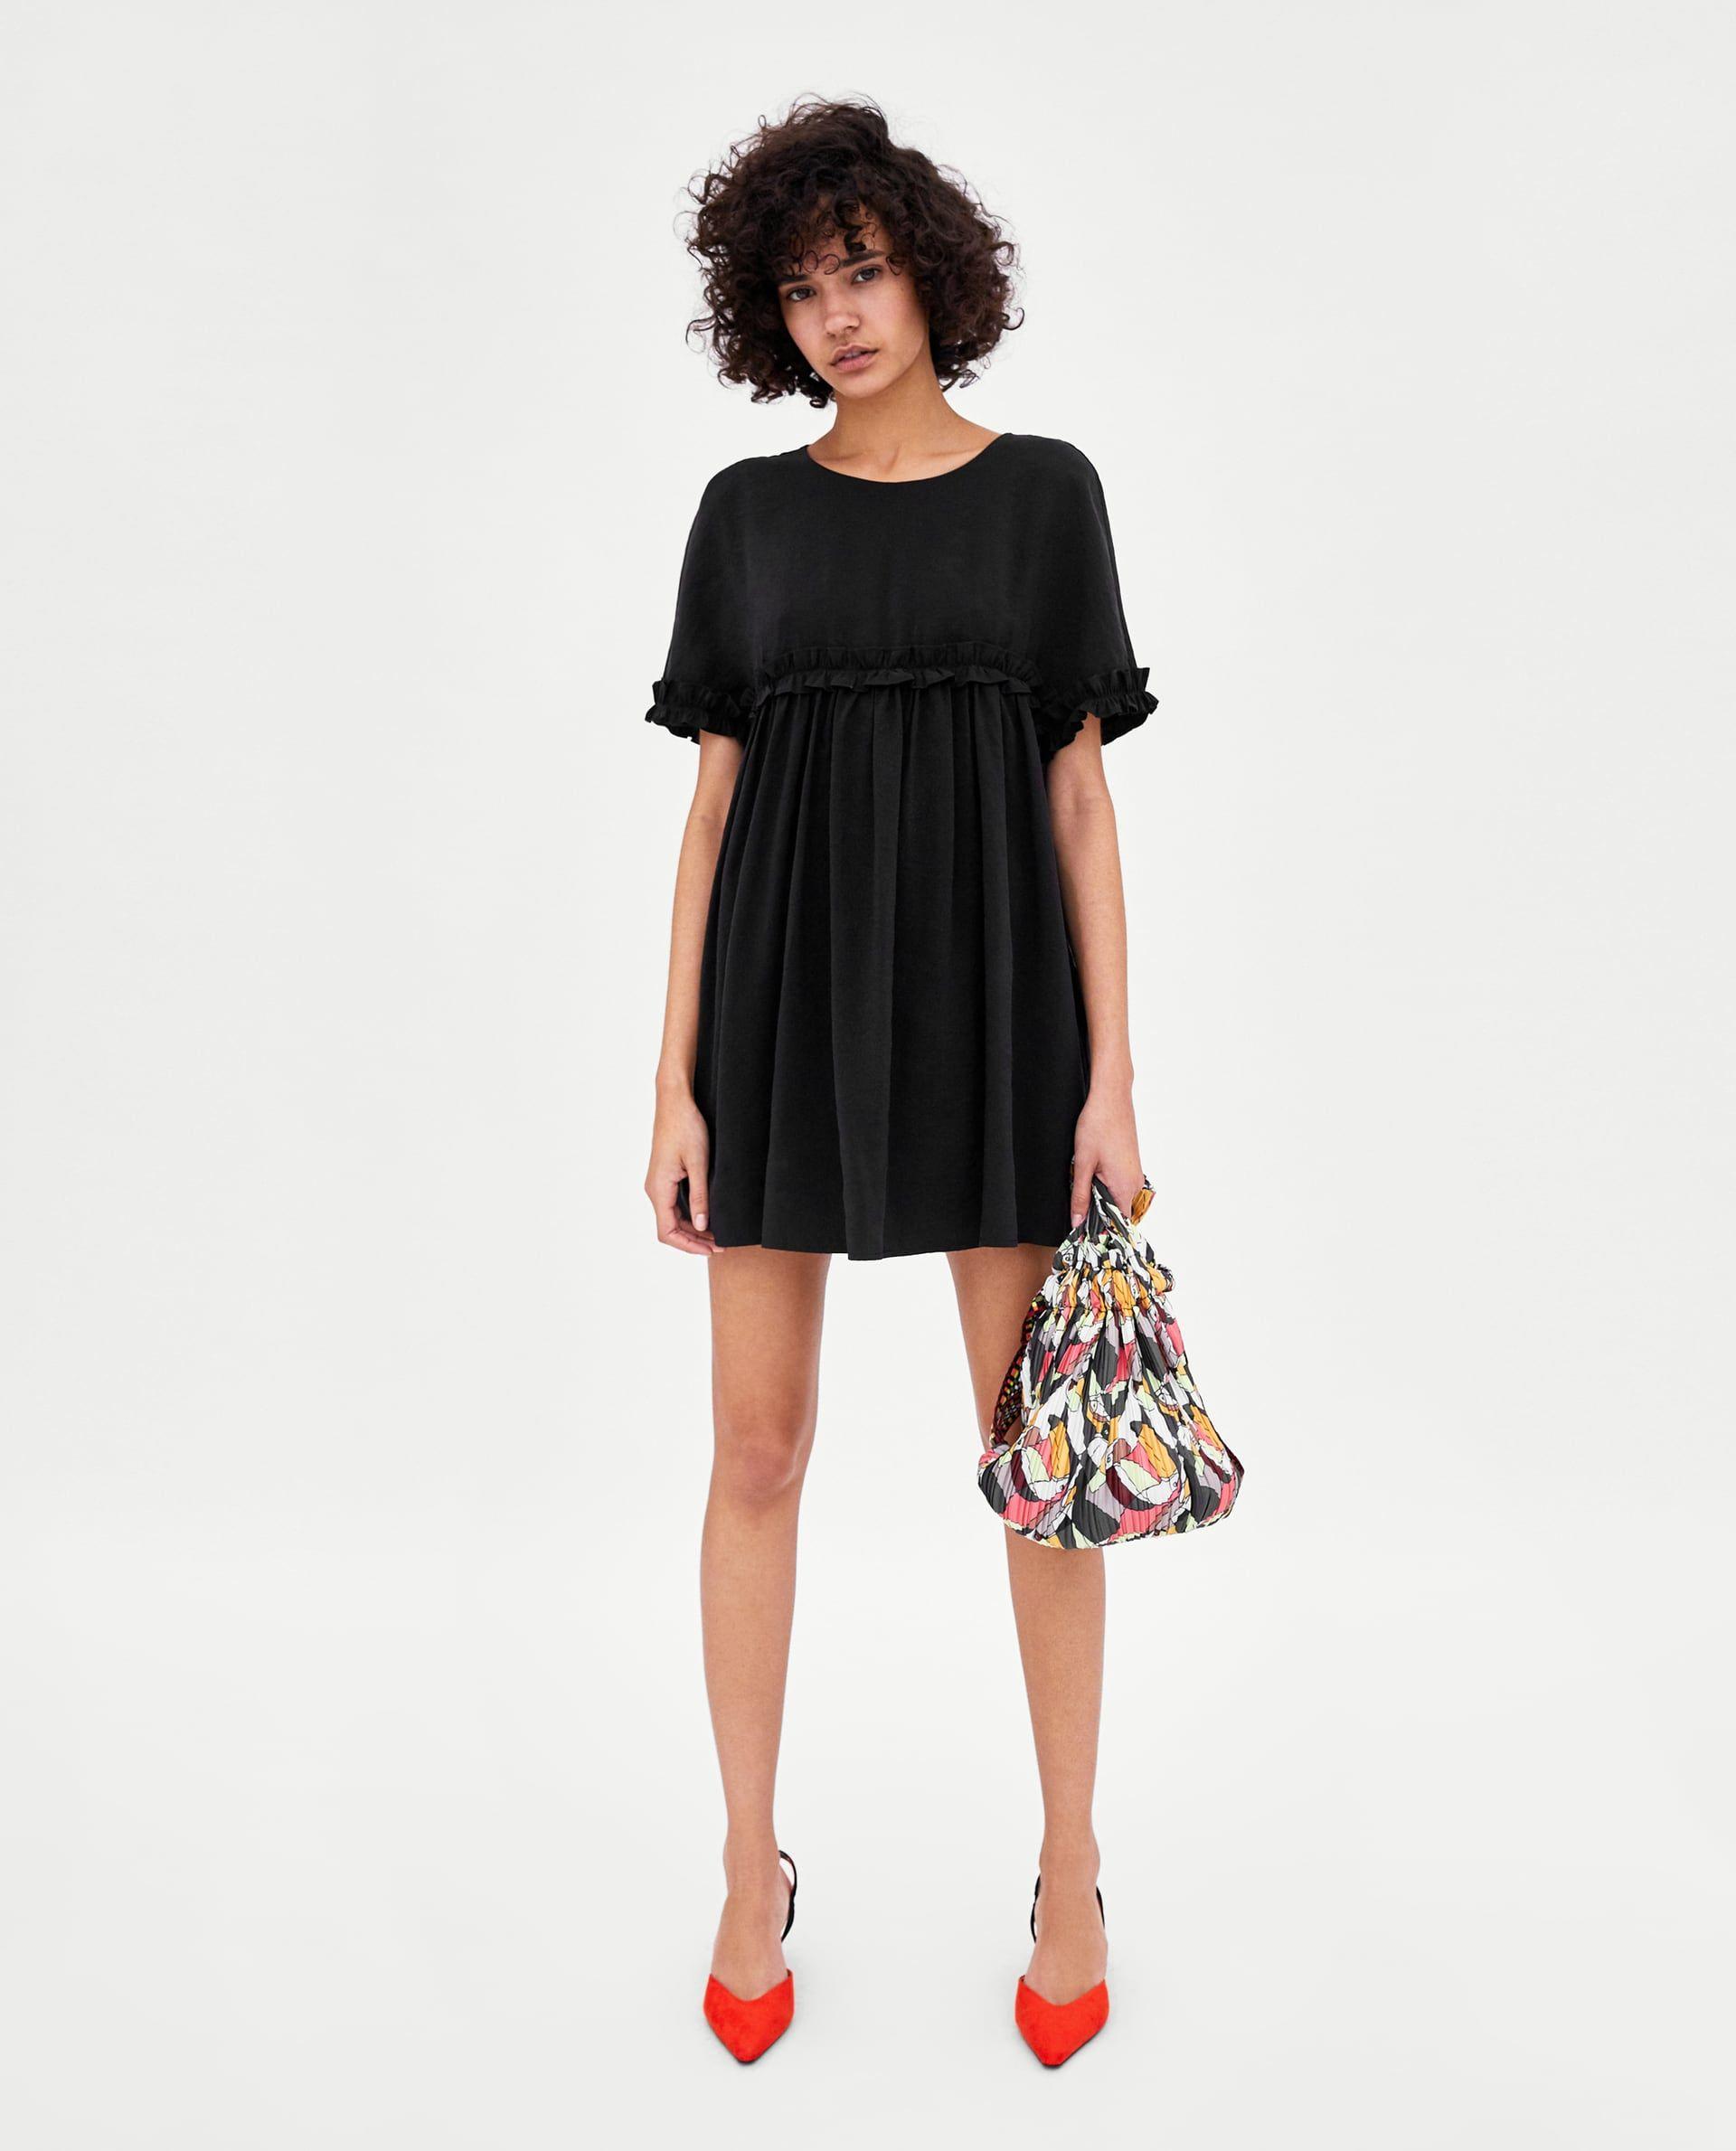 00e1b07c3ef dress for round one of sorority recruitment Zara Jumpsuit